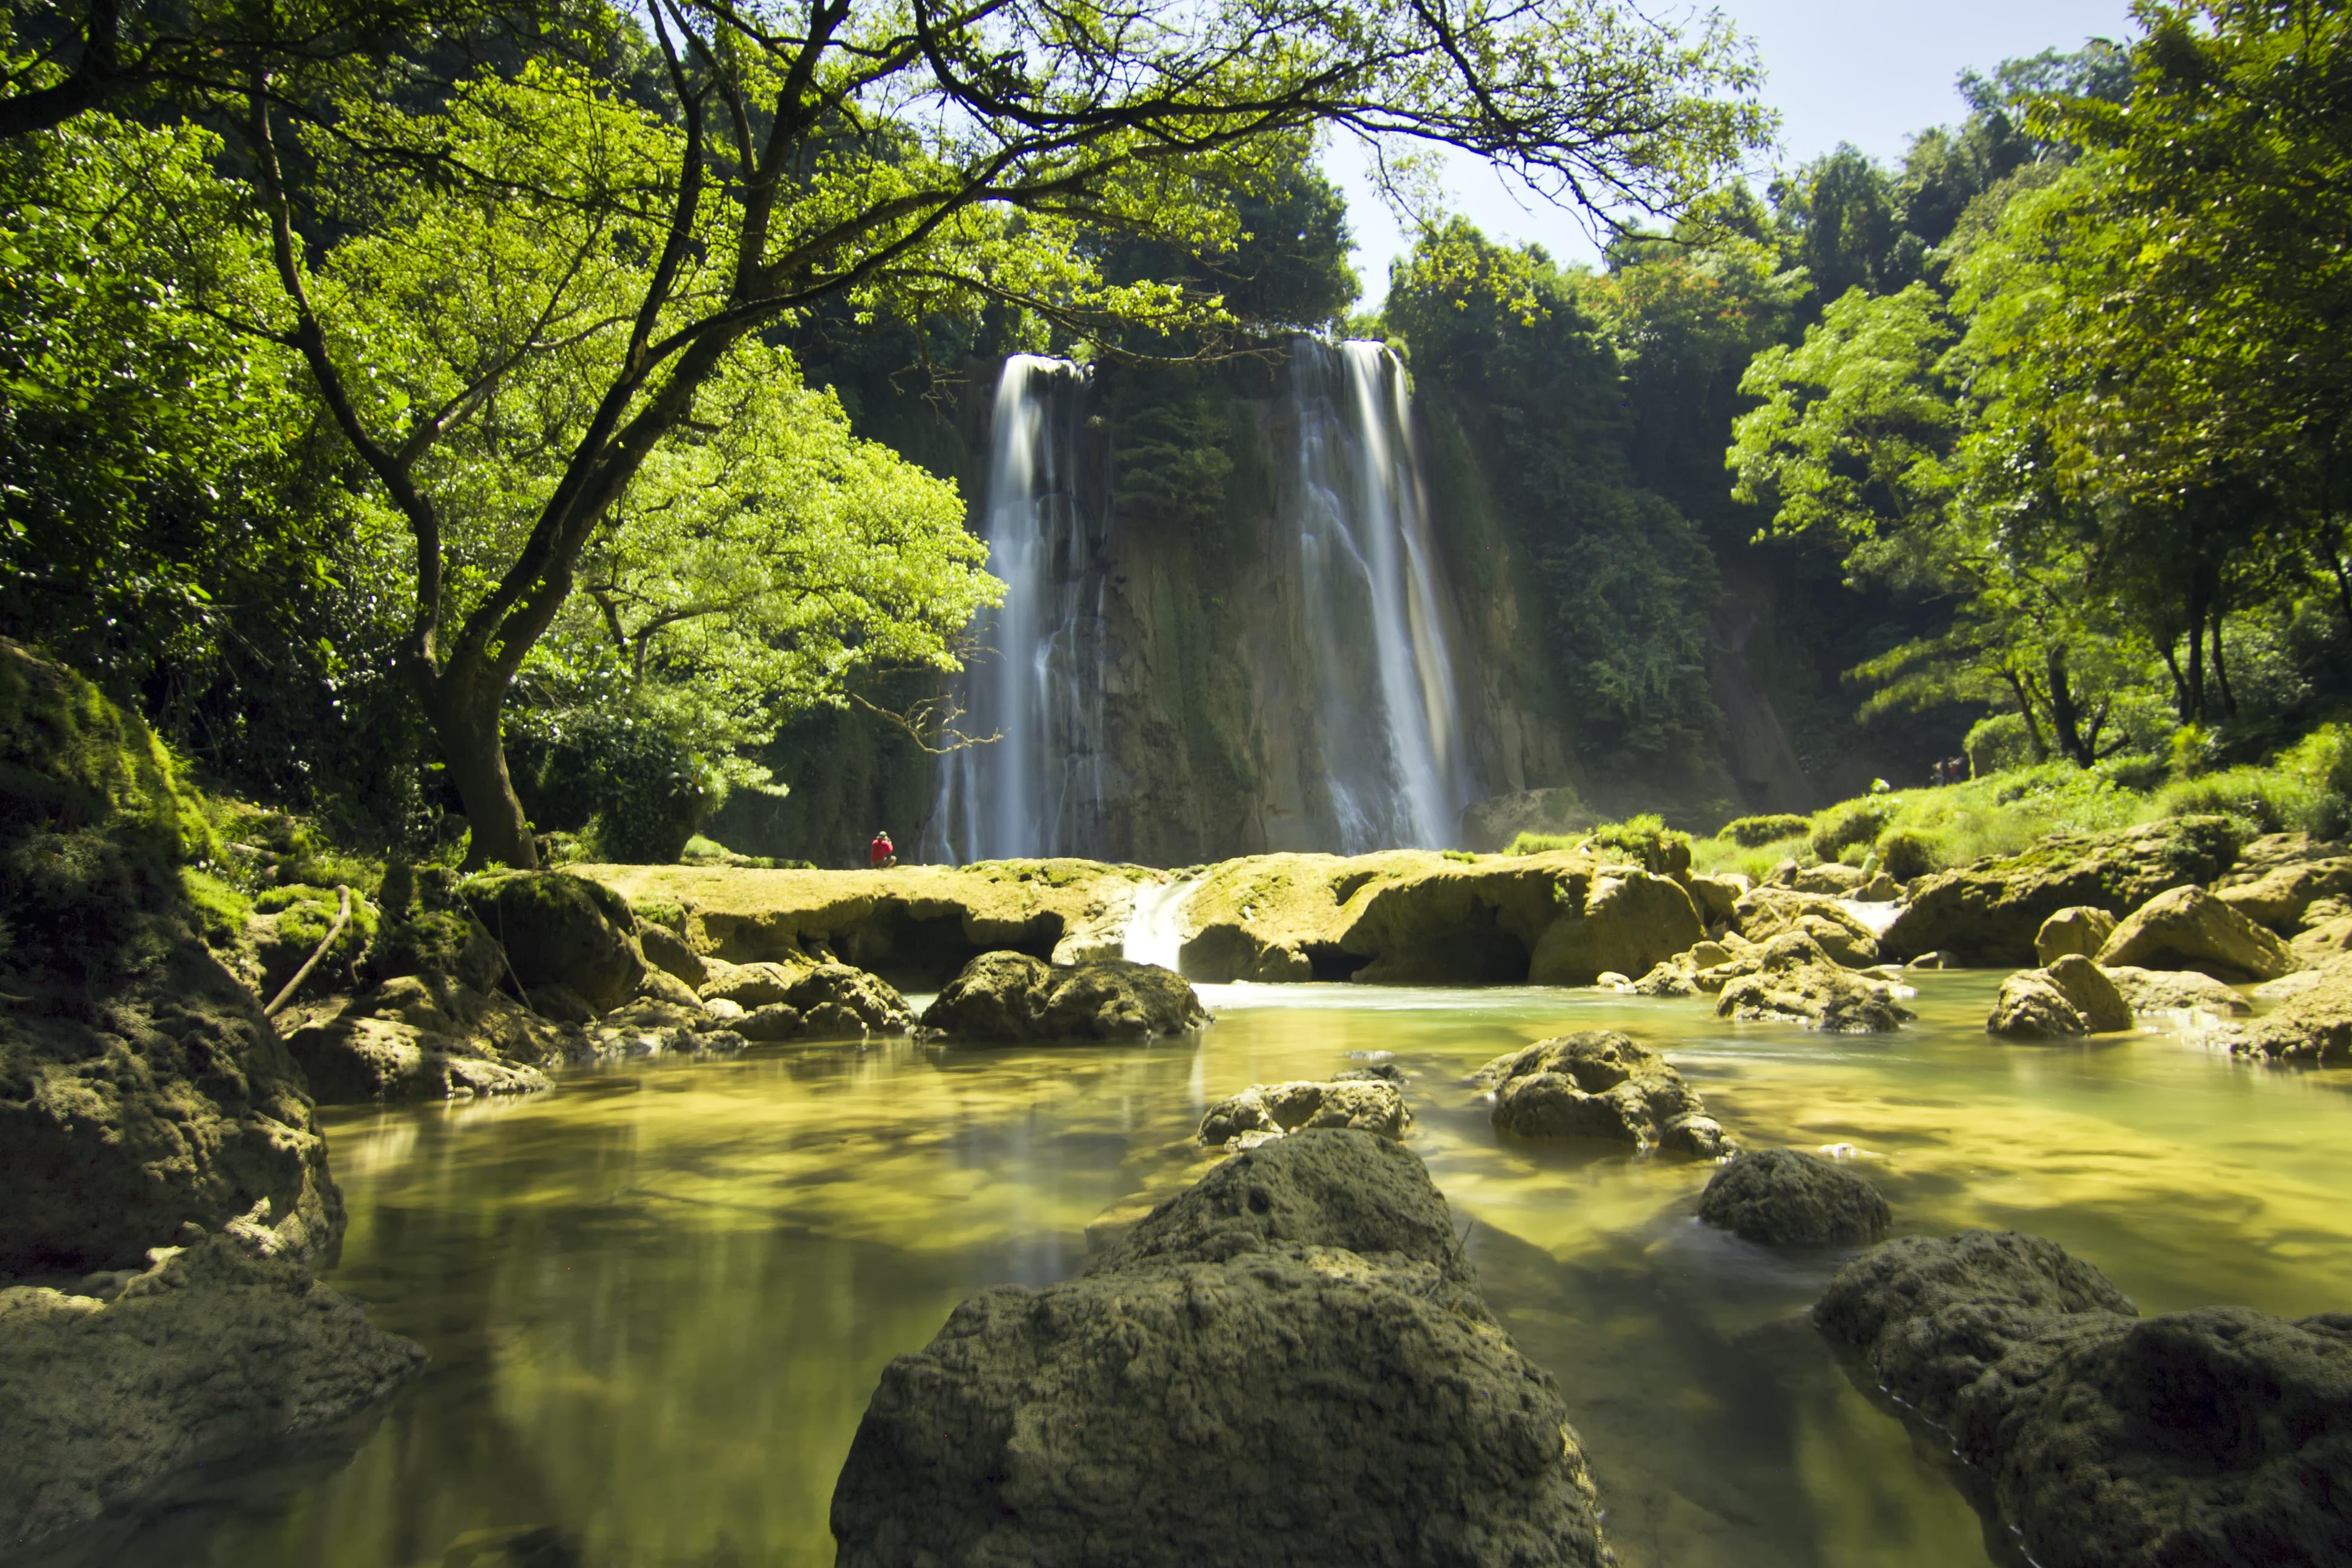 Air terjun Cikaso - Wikipedia bahasa Indonesia, ensiklopedia bebas